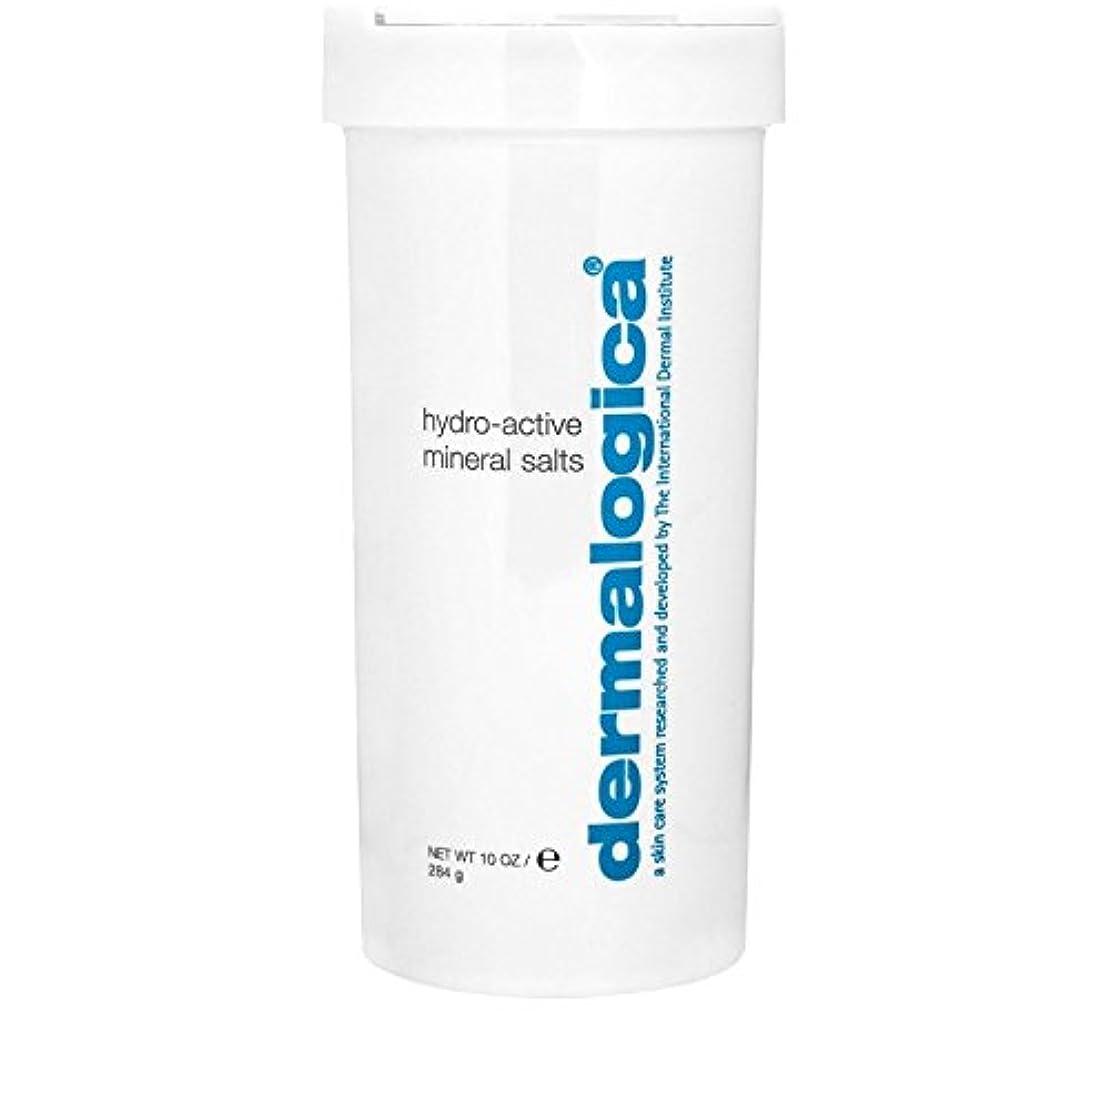 Dermalogica Hydro Active Mineral Salt 284g - ダーマロジカ水力アクティブミネラル塩284グラム [並行輸入品]